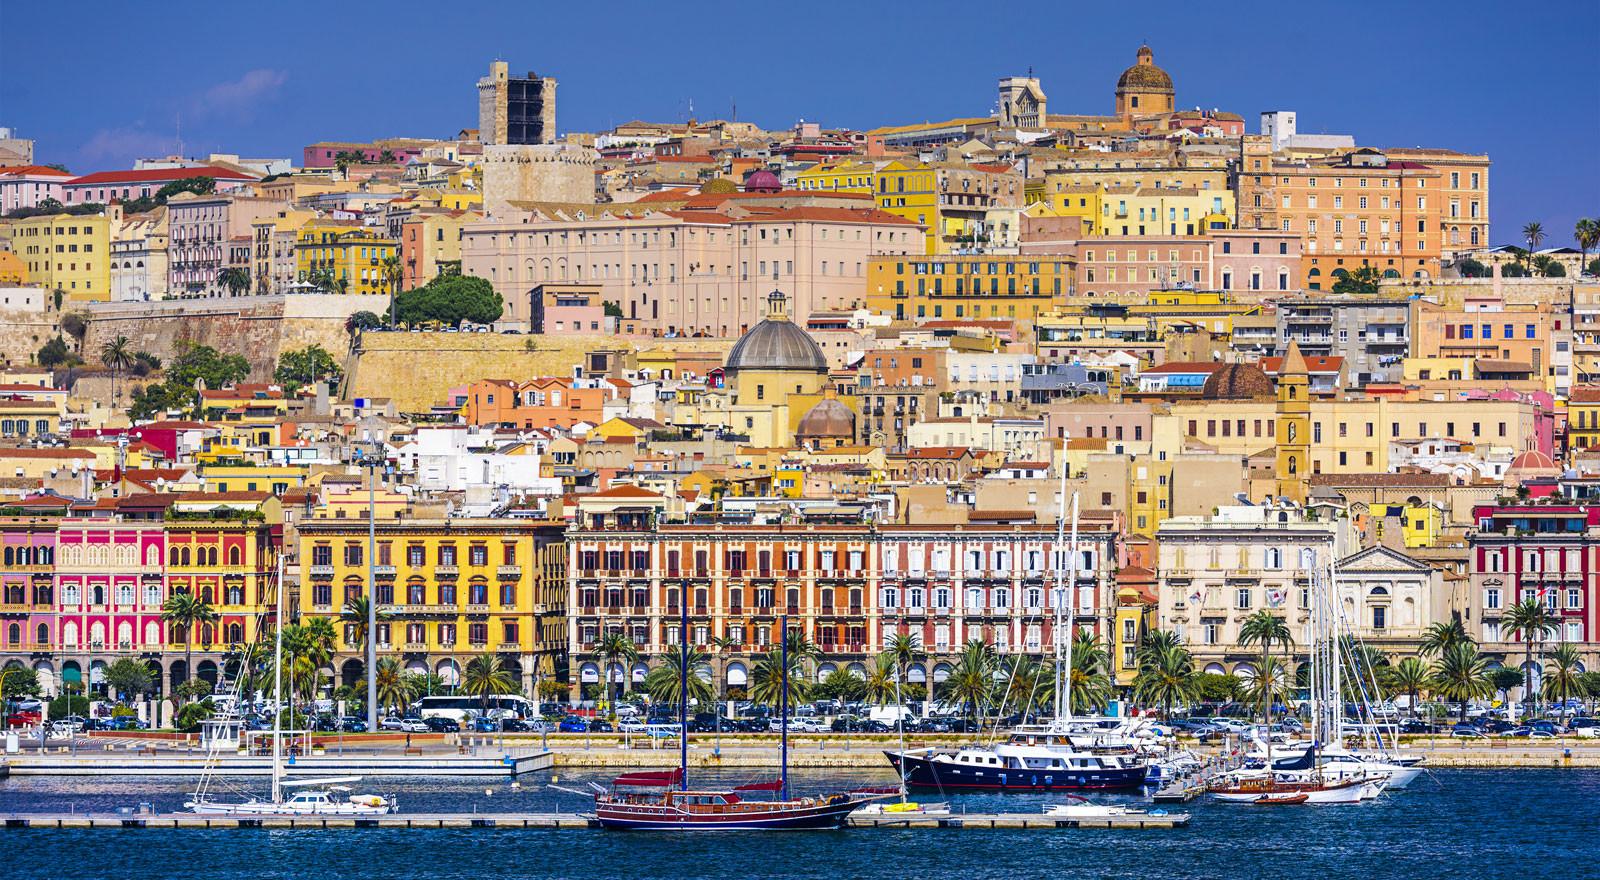 Expérience Erasmus à Cagliari, en Italie, par Vanessa